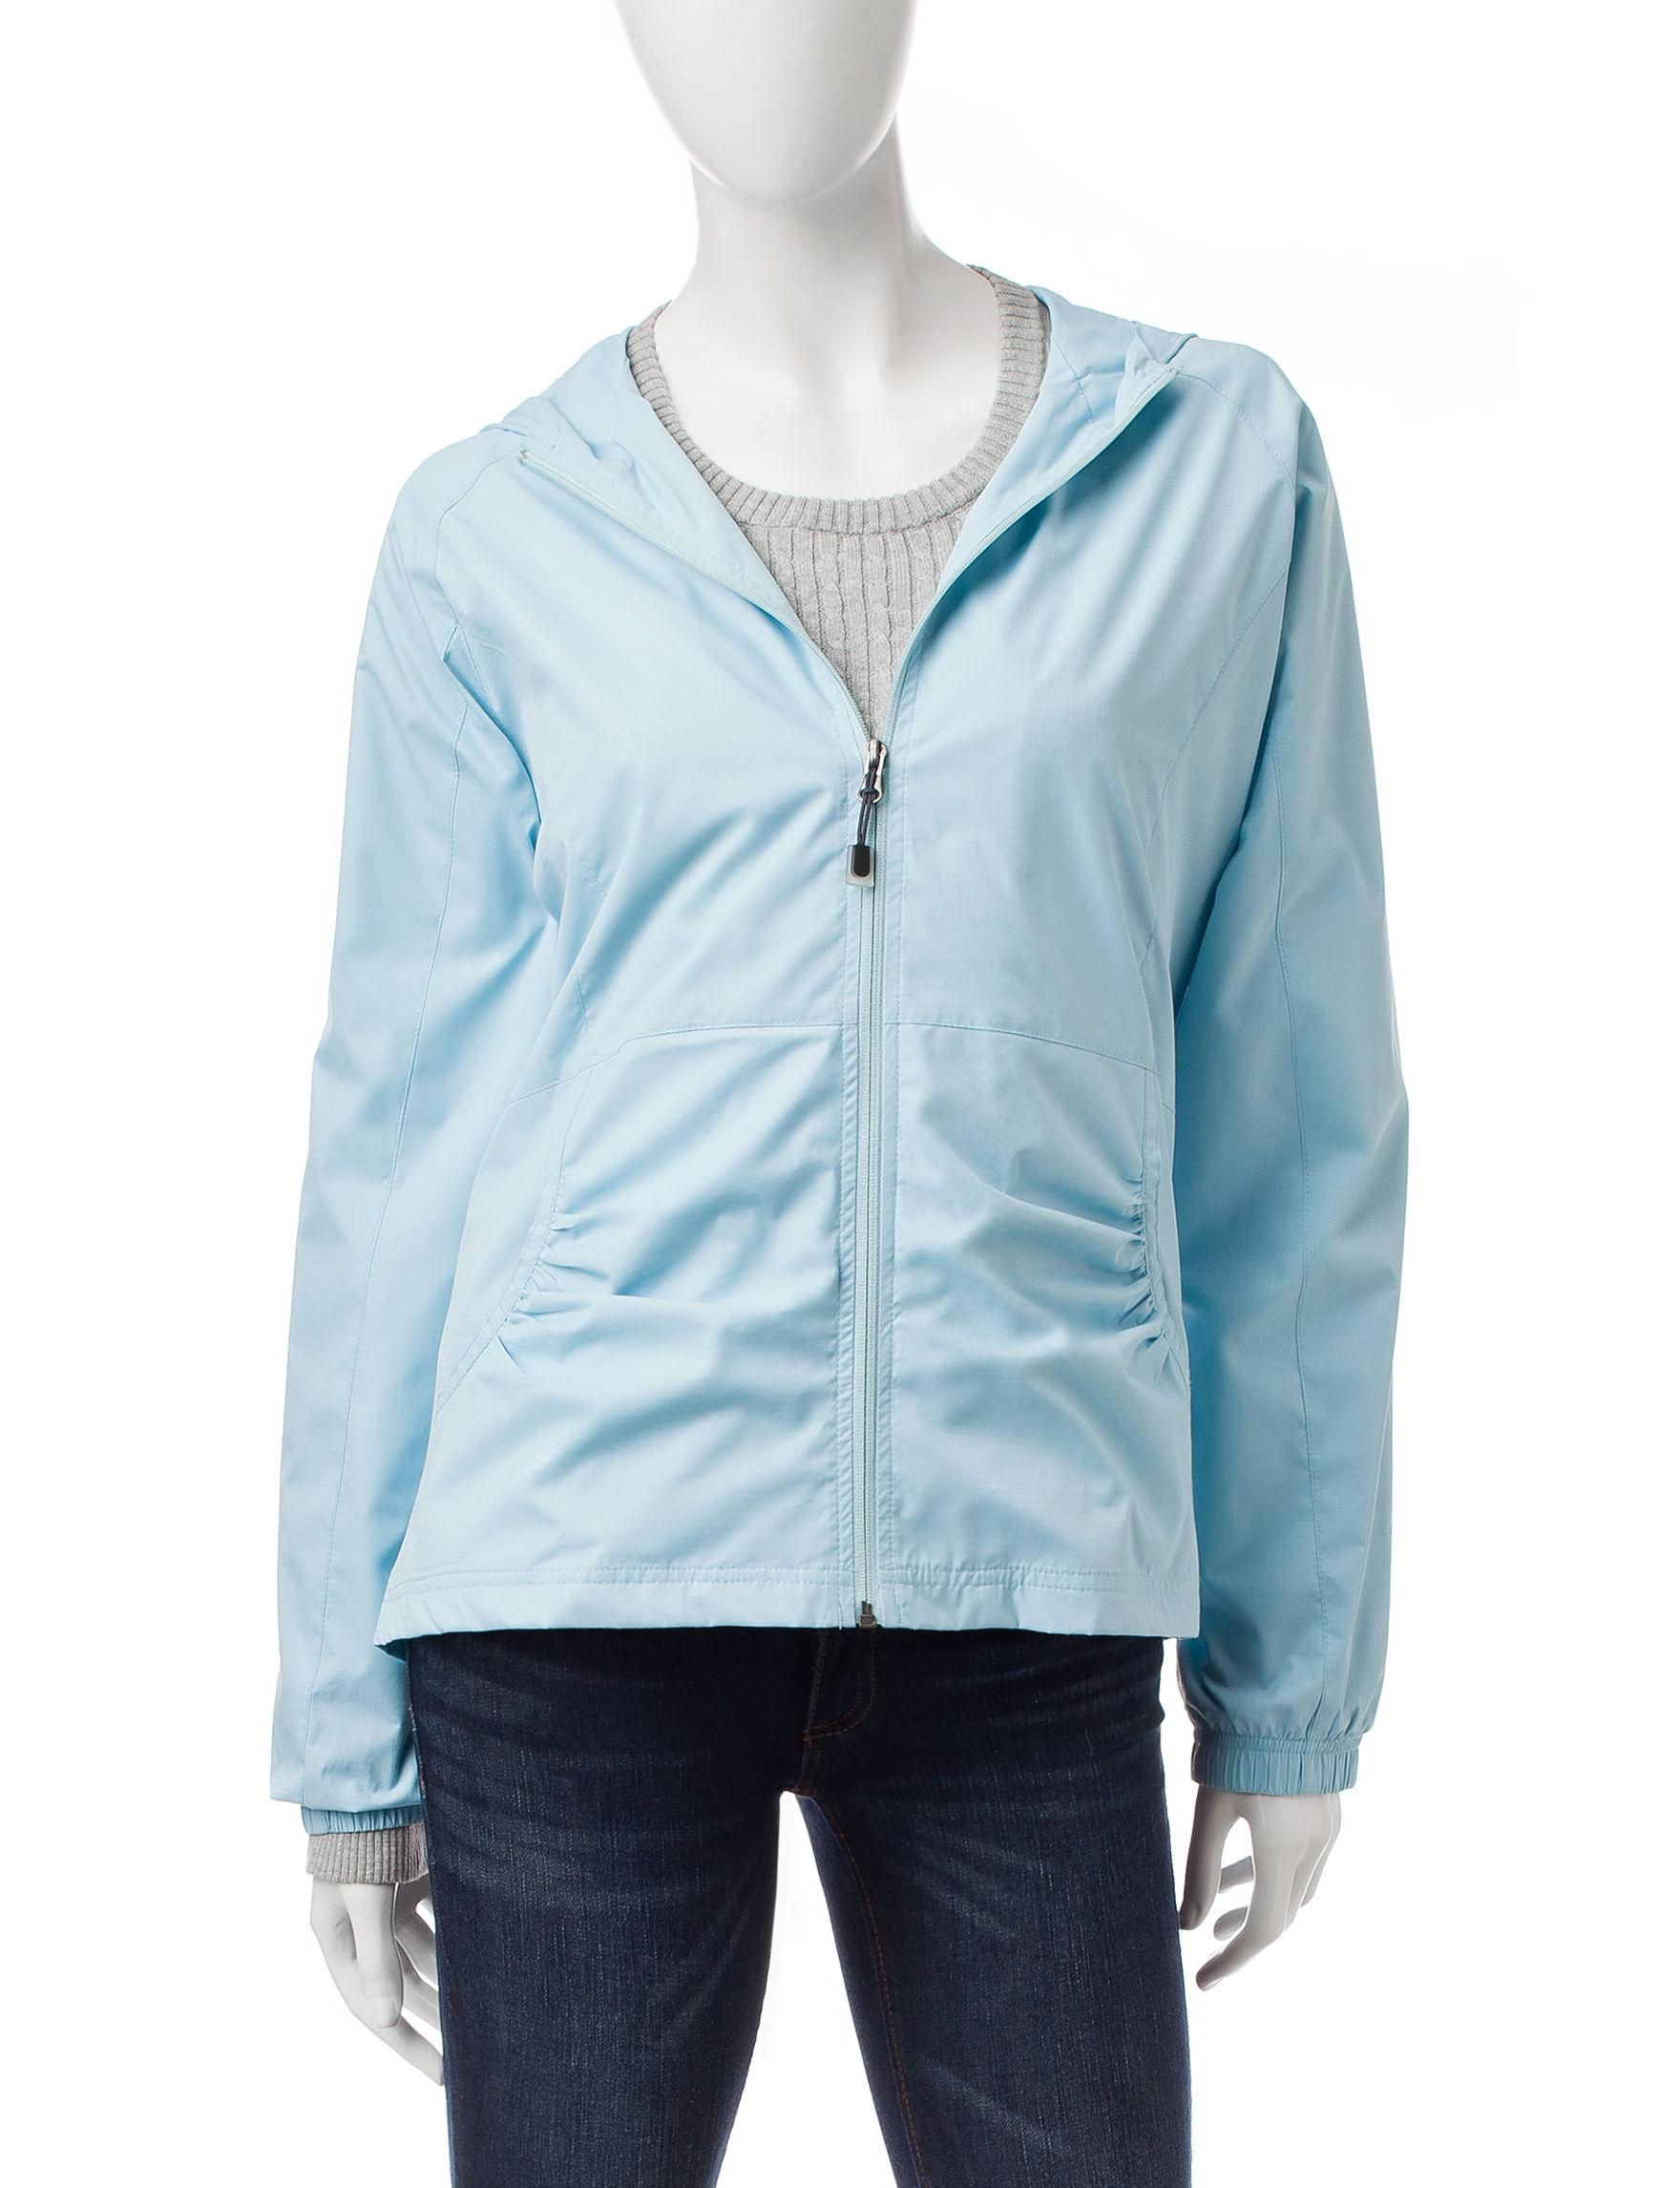 Mackintosh Blue Lightweight Jackets & Blazers Rain & Snow Jackets